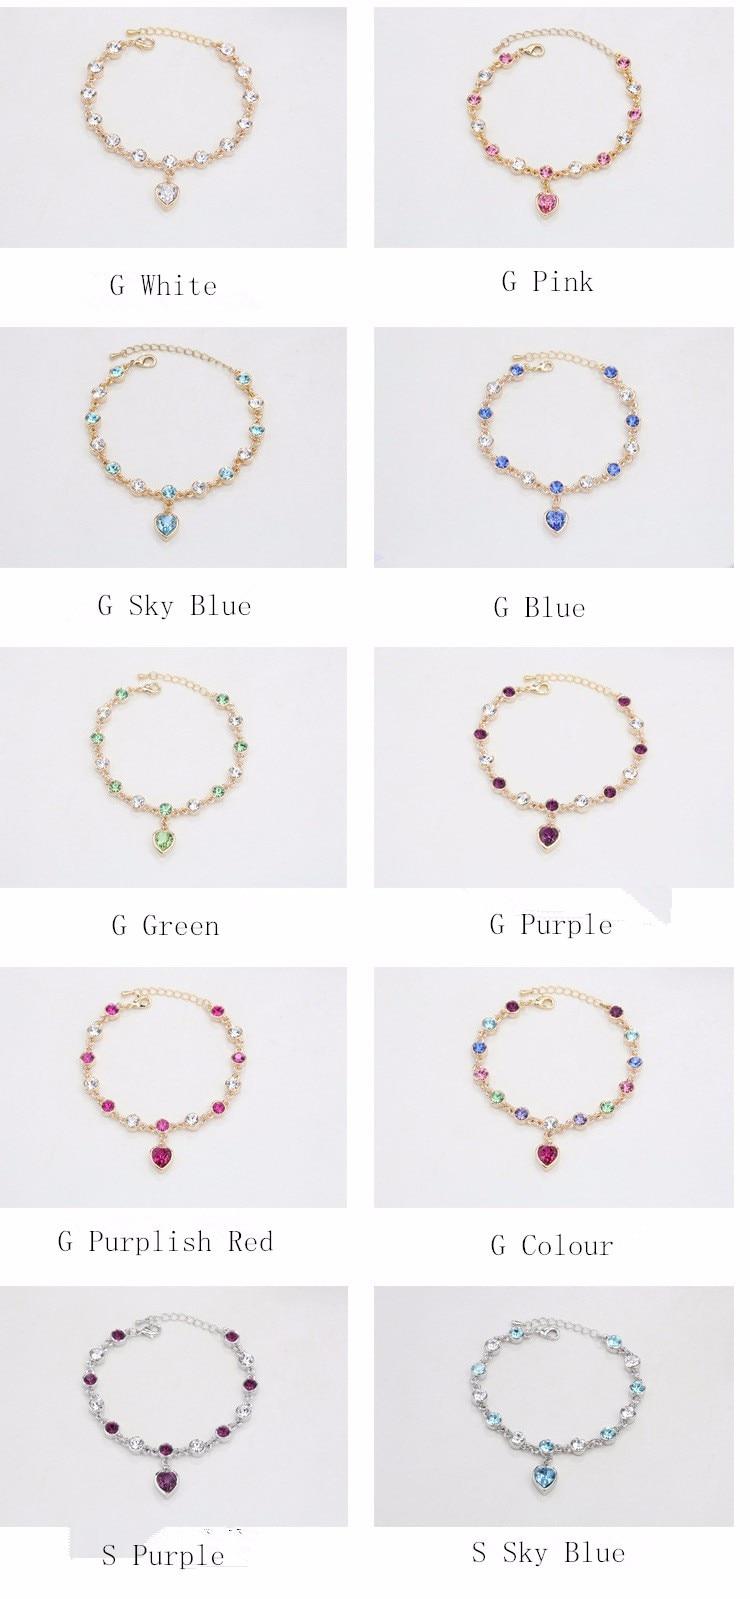 LYIYUNQ Fashion Bracelet Hot Wedding Female Heart Crystal Bracelets For Women Luxury Temperament Silver-Color Fine Jewelry Gift 15